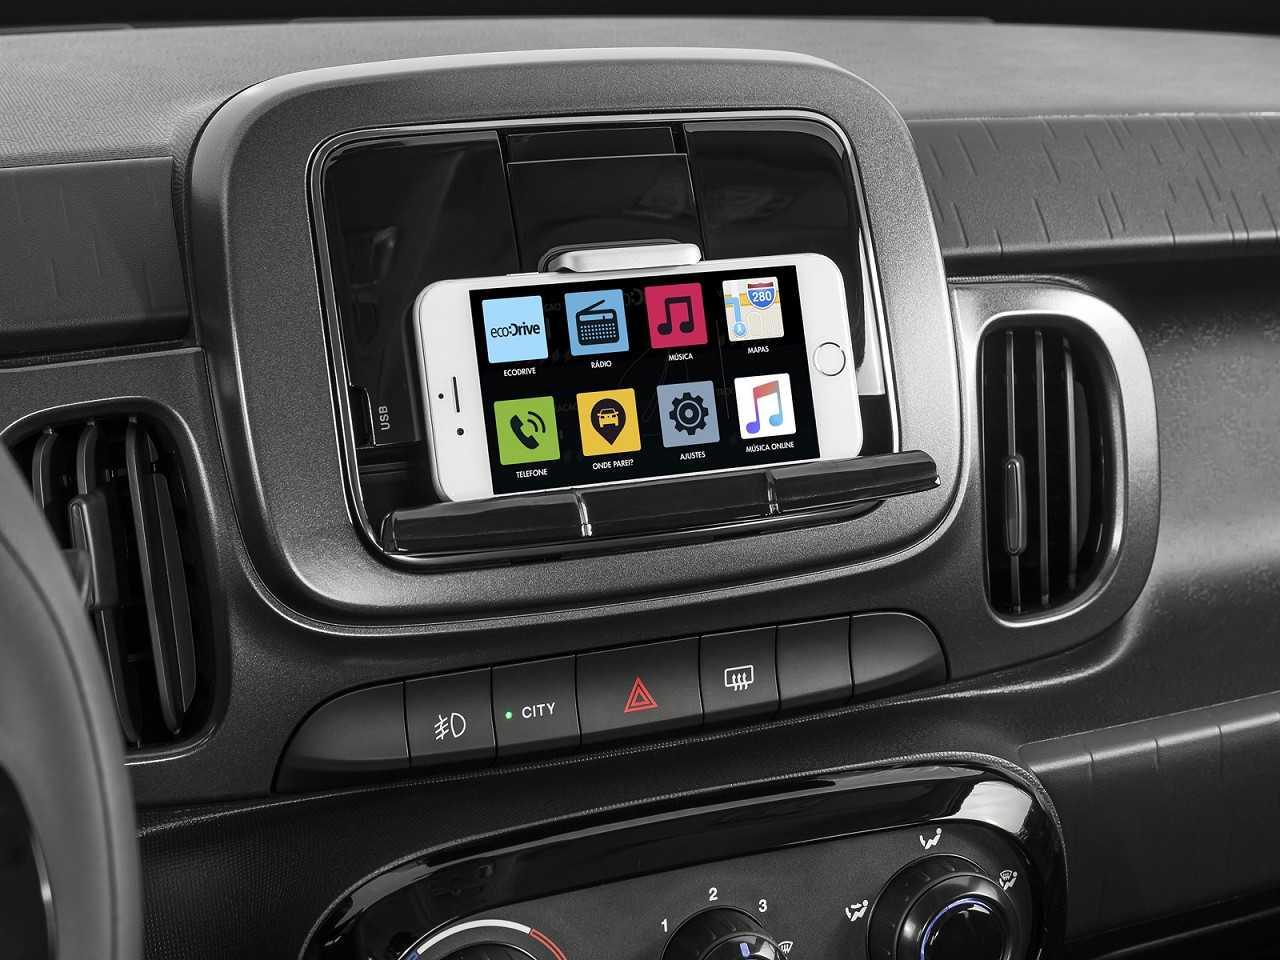 FiatMobi 2018 - console central